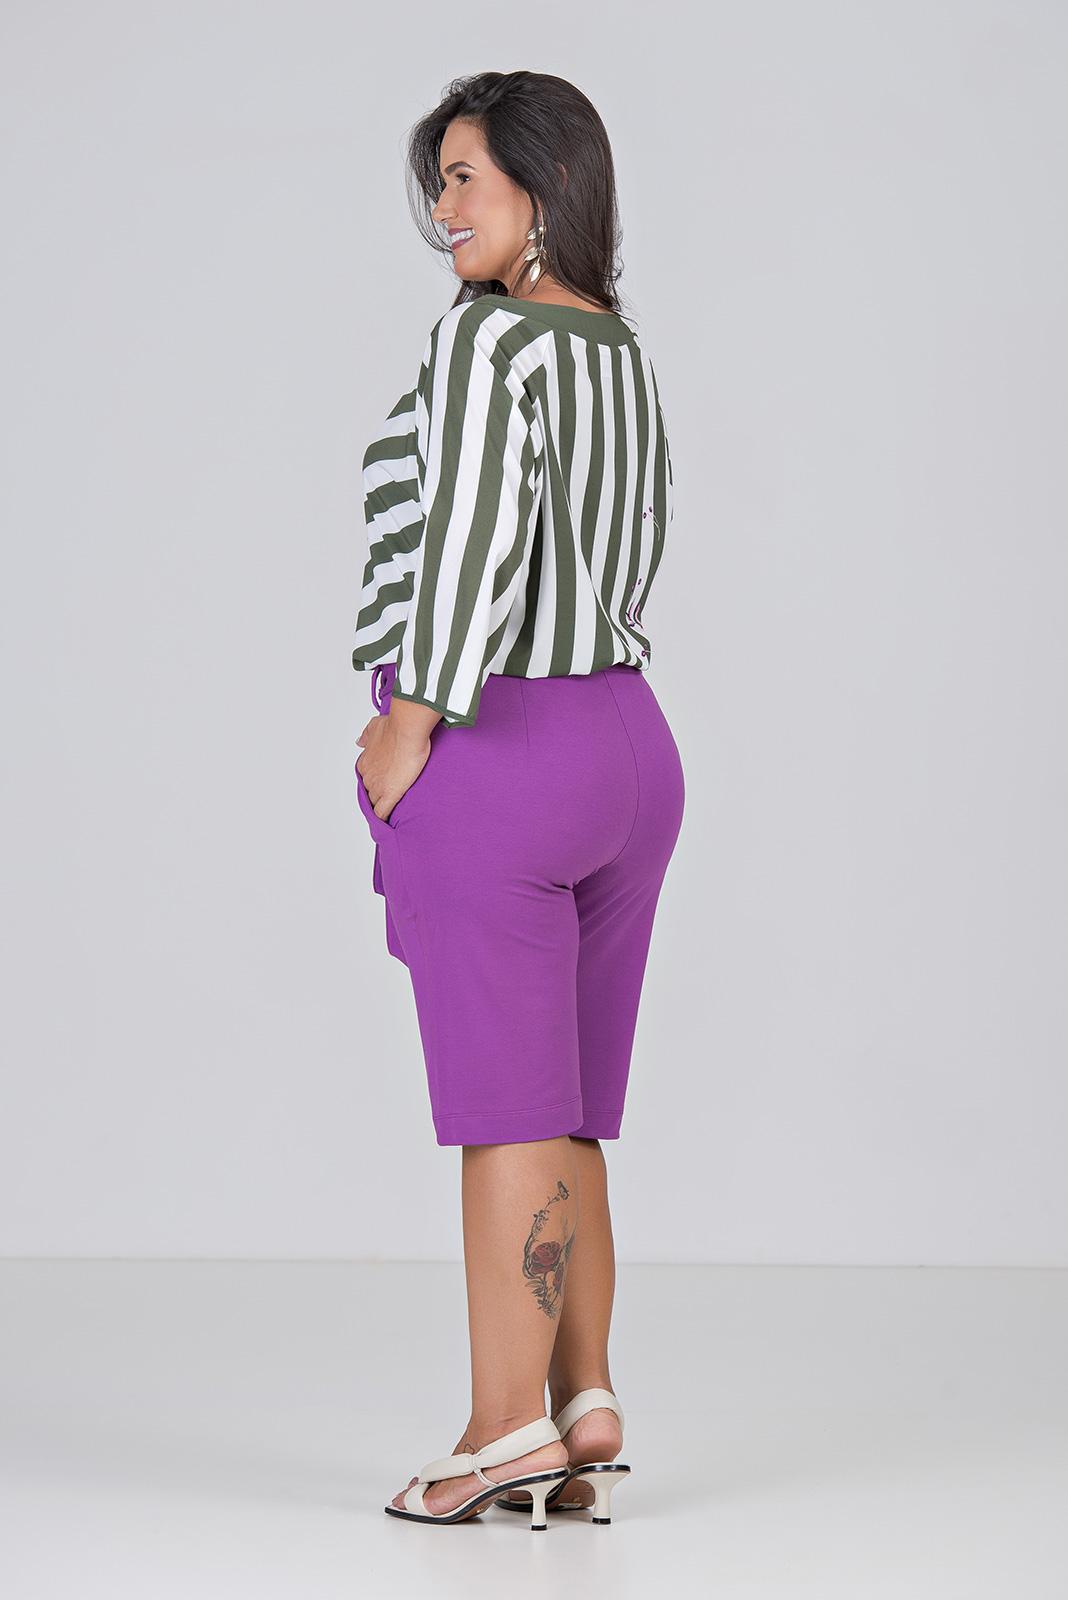 Blusa Com Pala no Decote - Plus Size